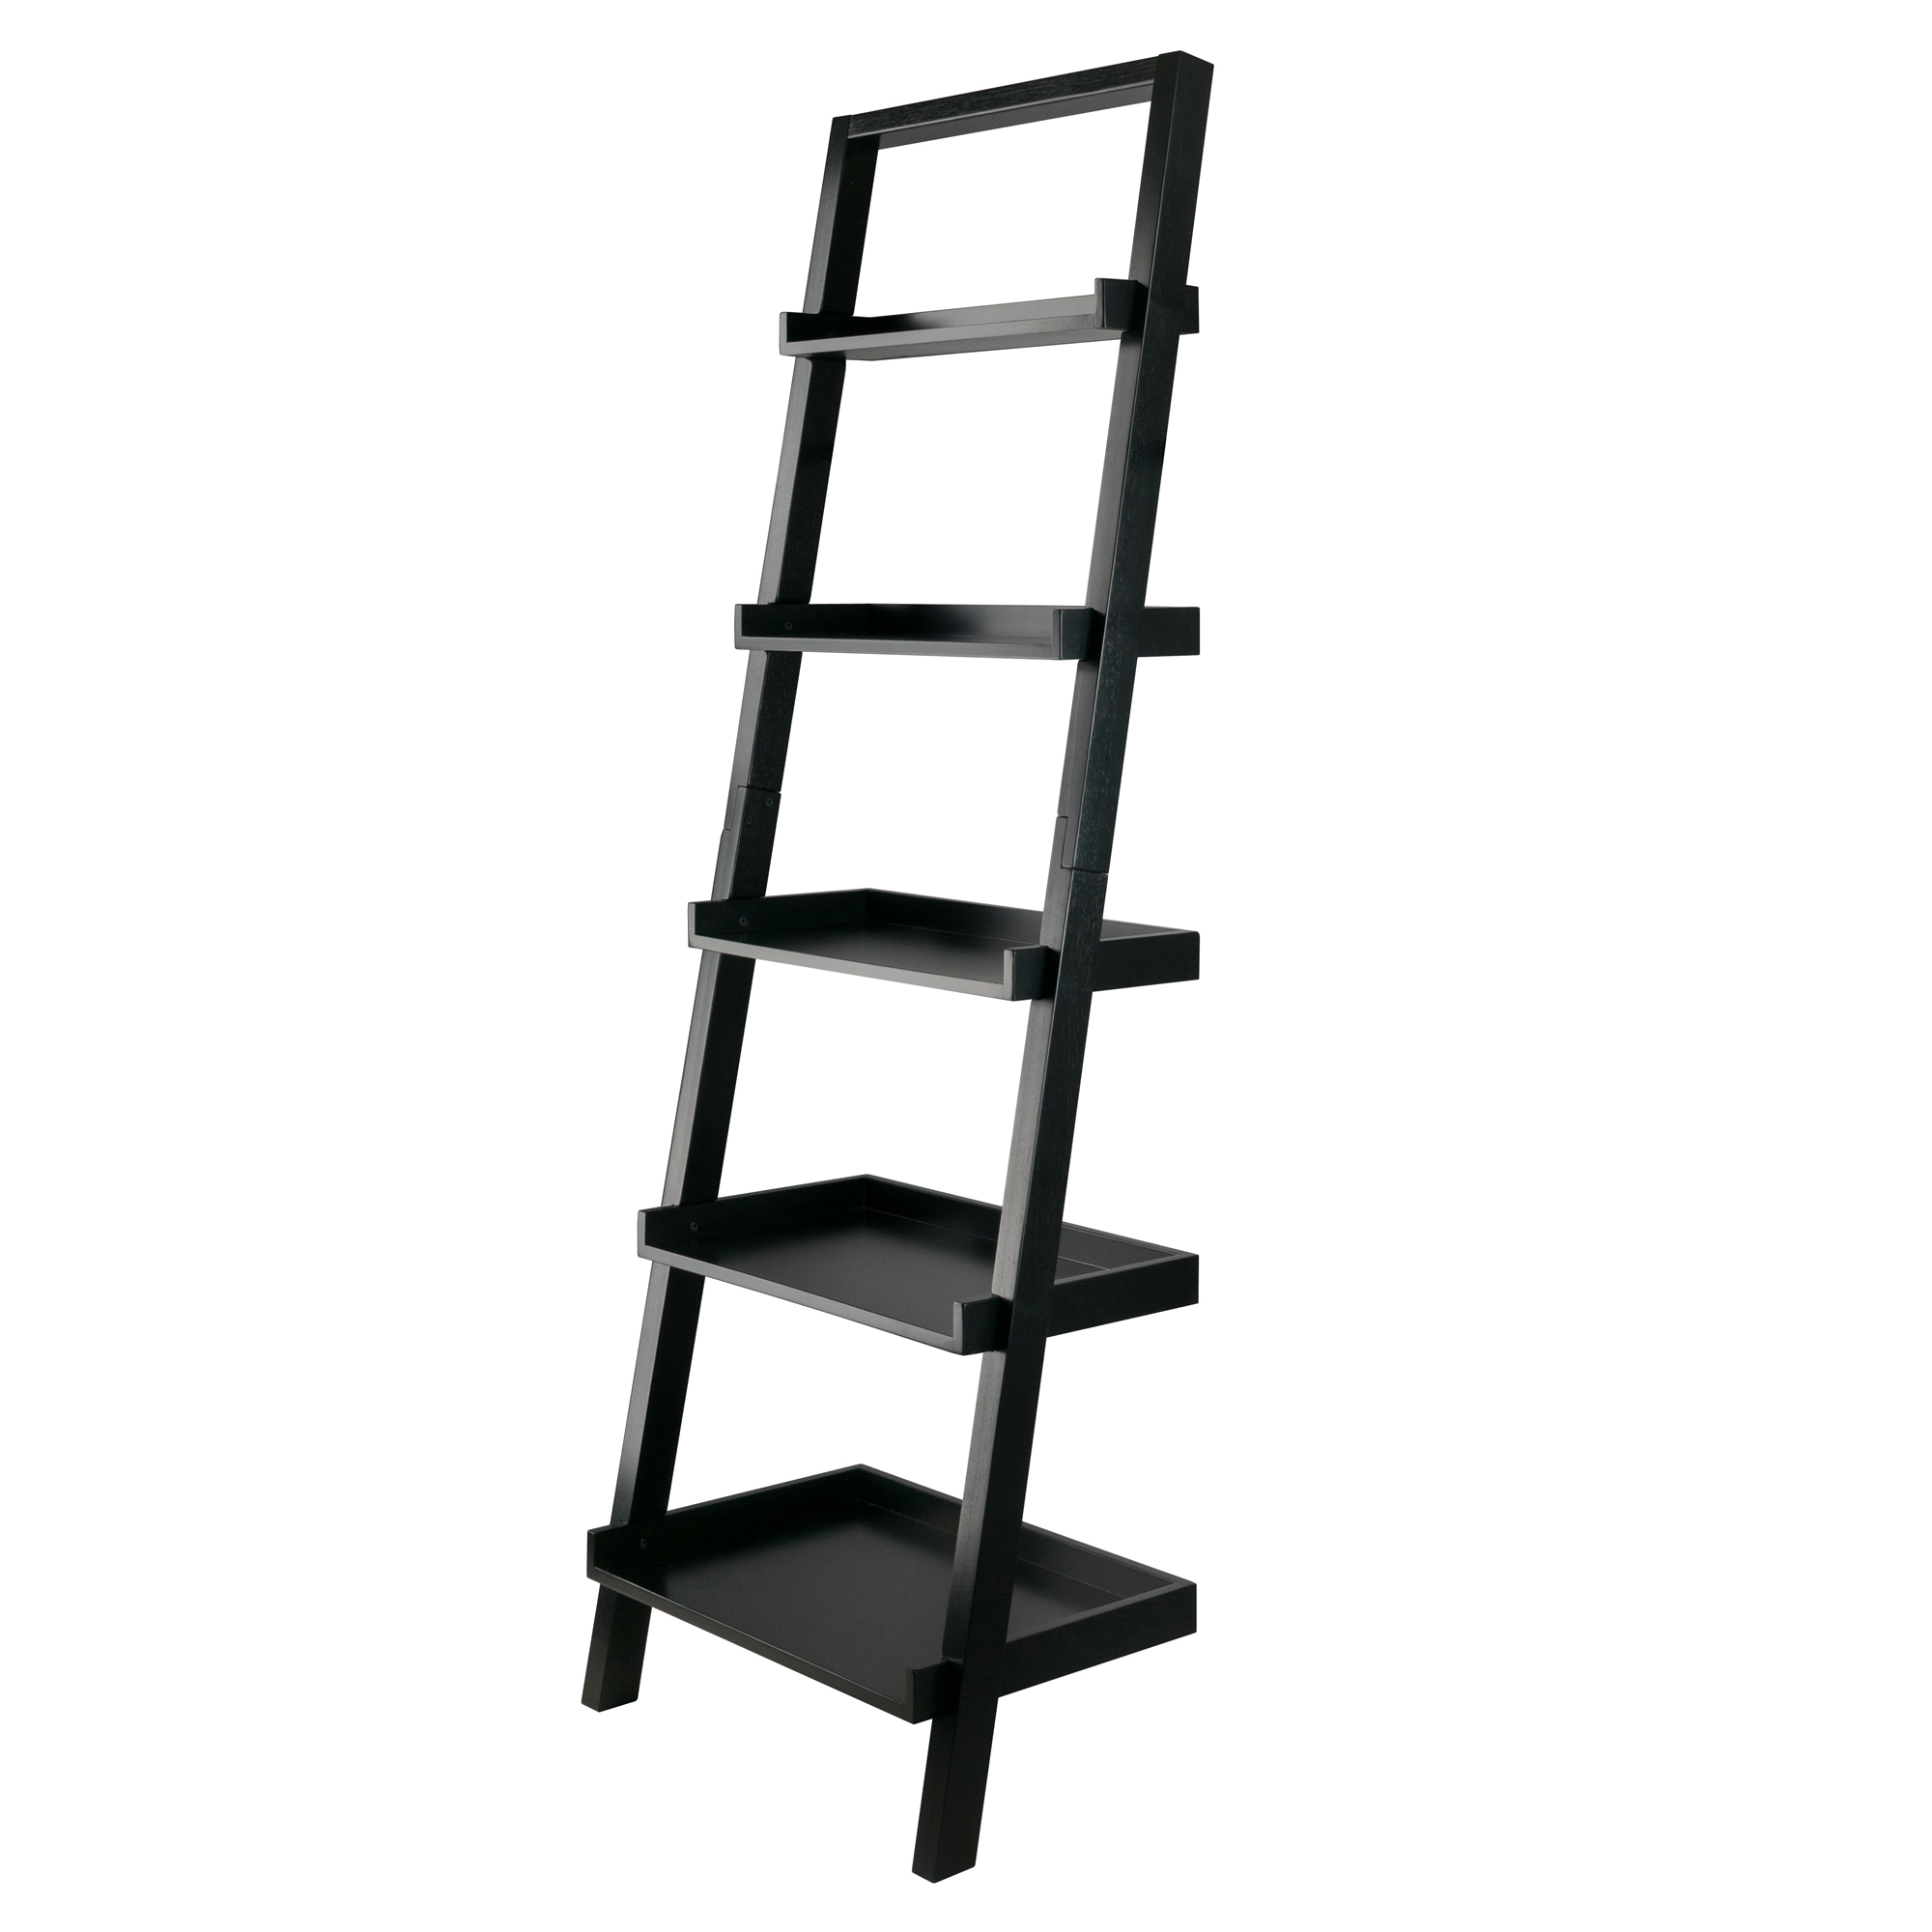 Winsome Wood Bellamy Leaning Shelf Black Finish